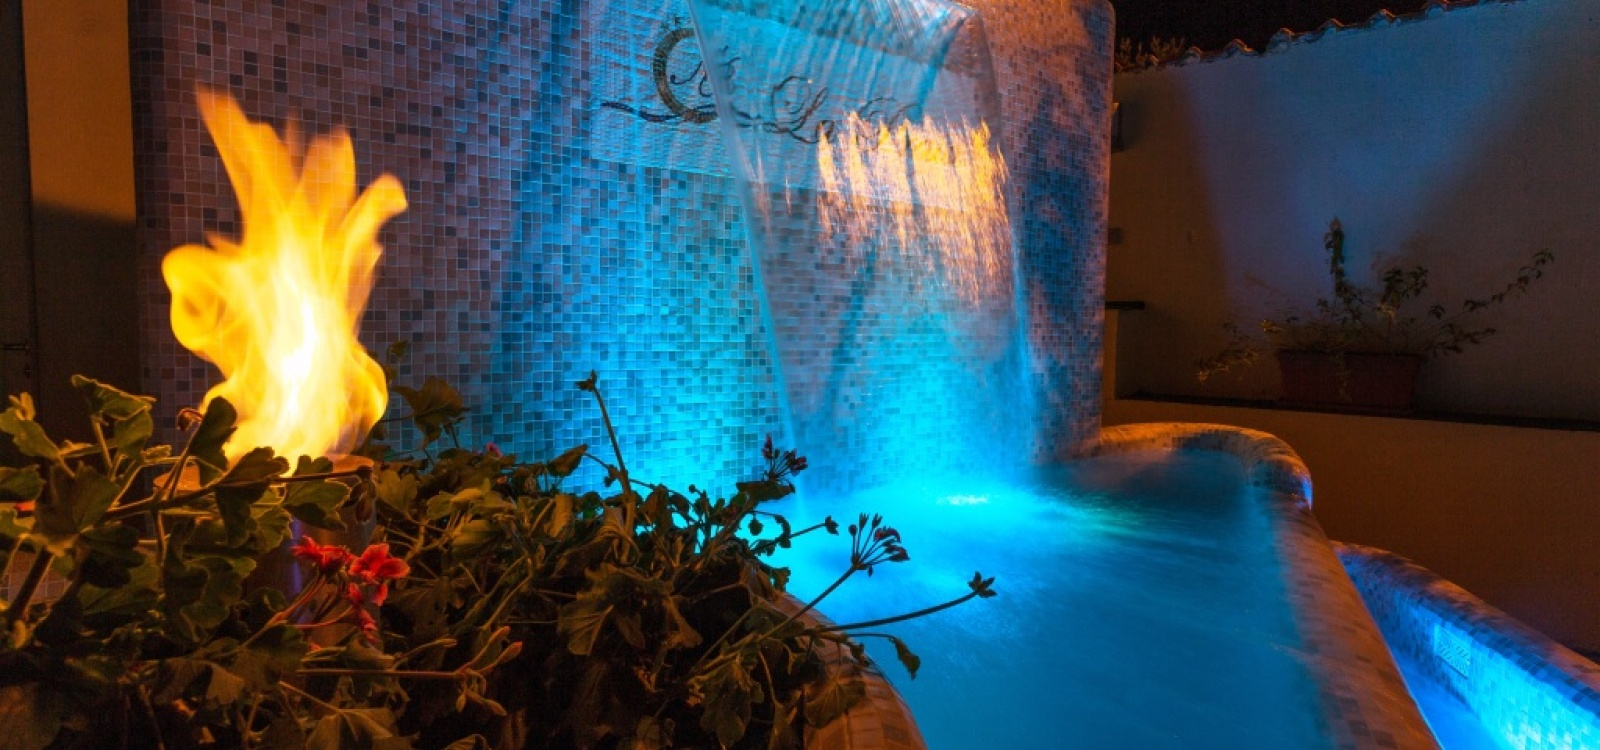 Hotel La Praia, foto notturna